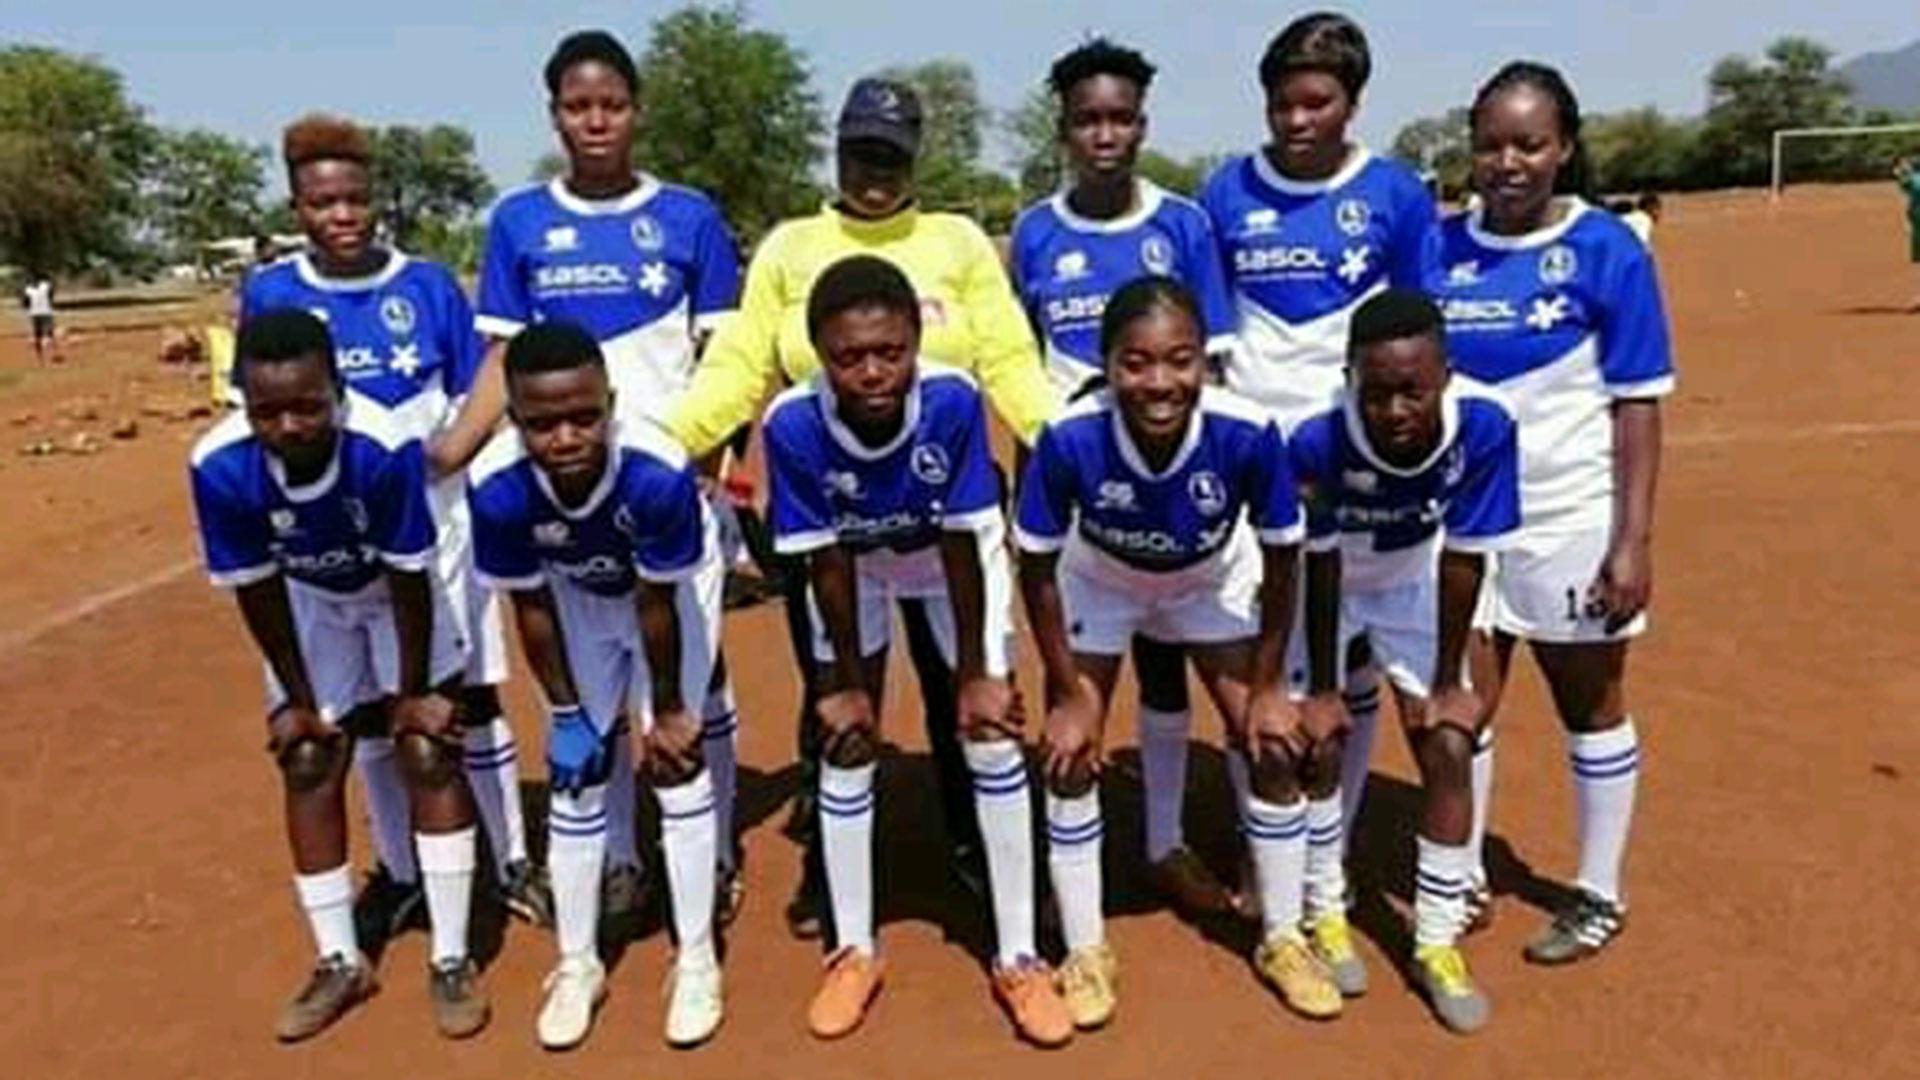 team photo of Merwe united ladies team